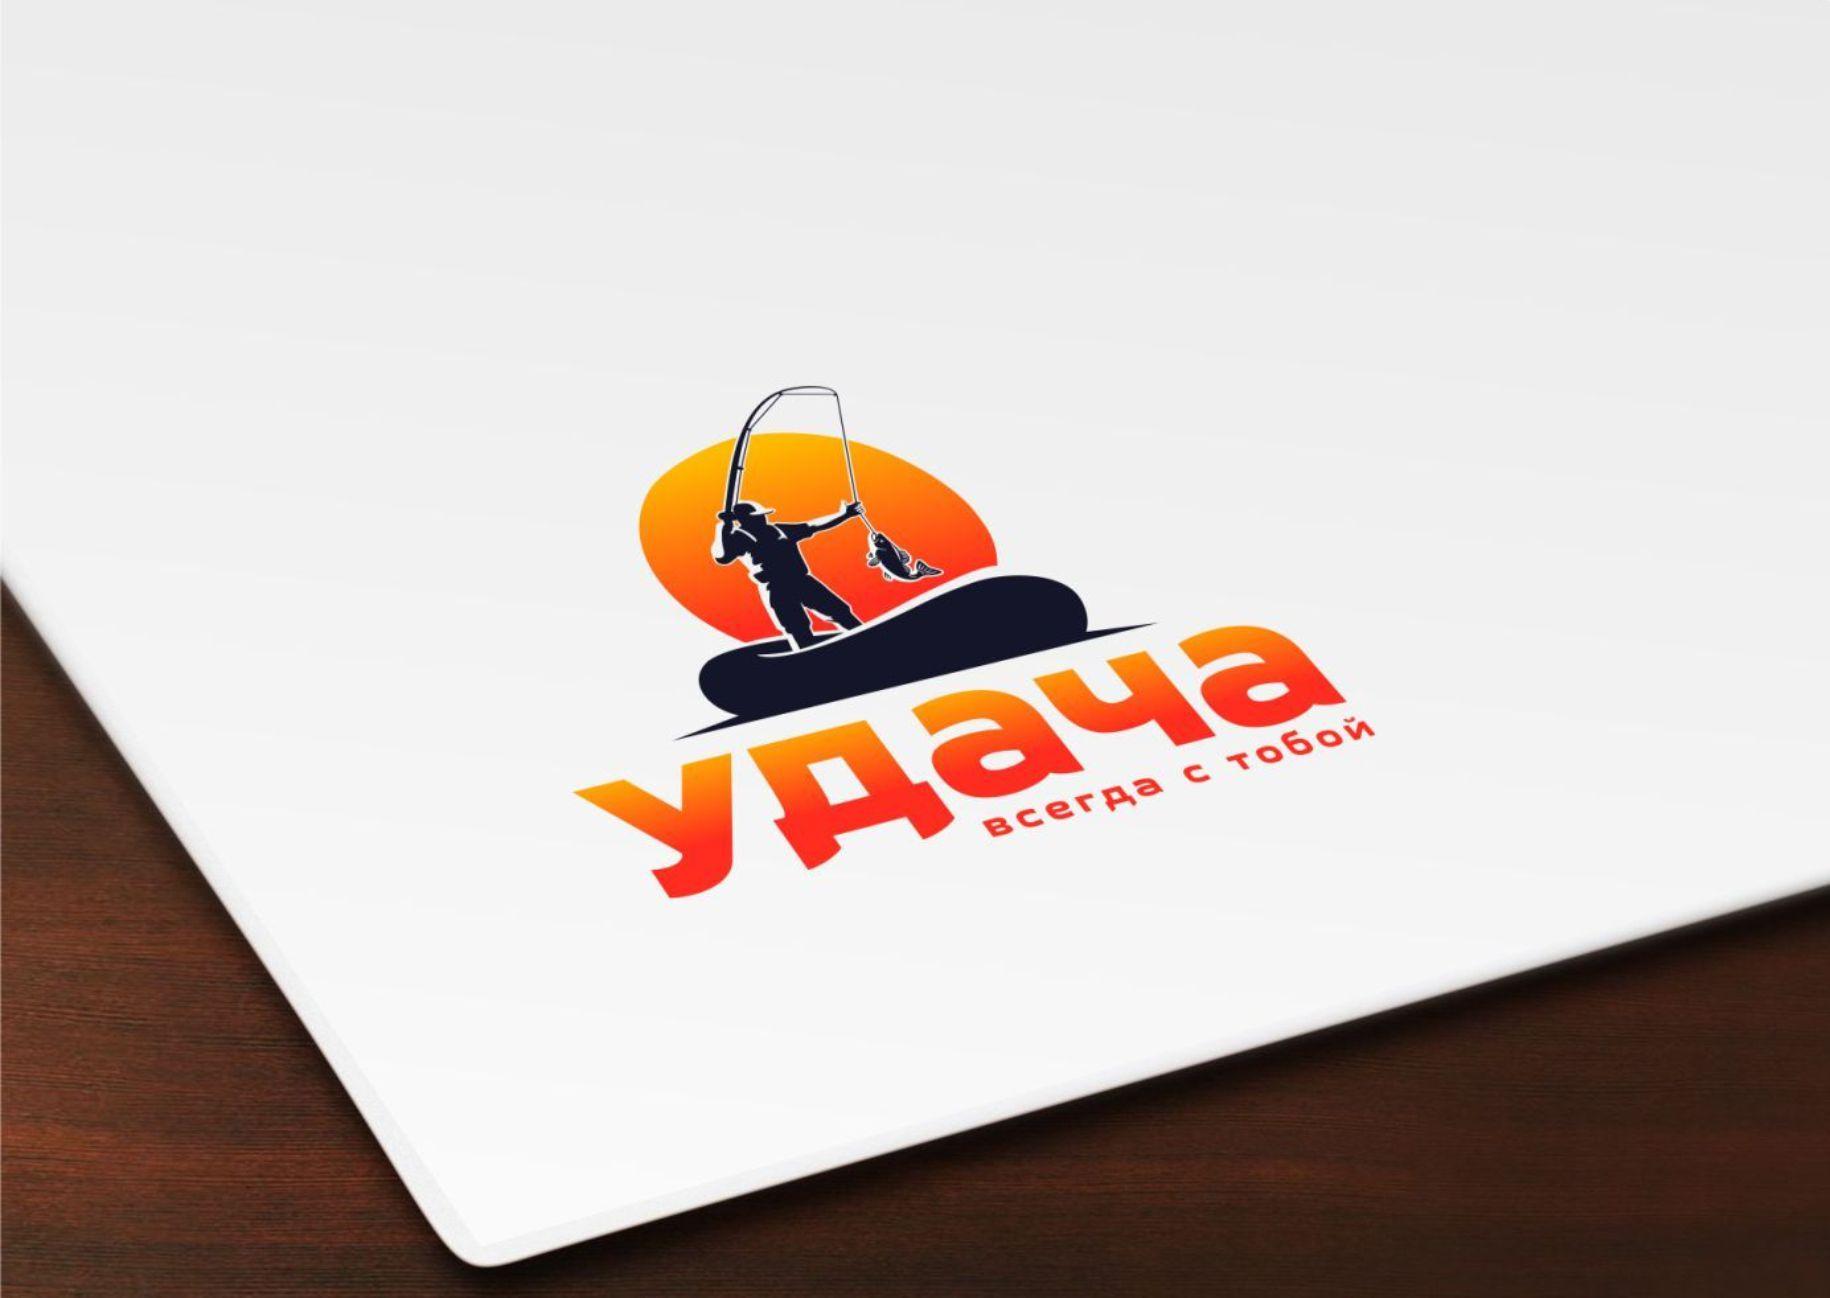 конкурс 1 место логотип рыболовного магазина